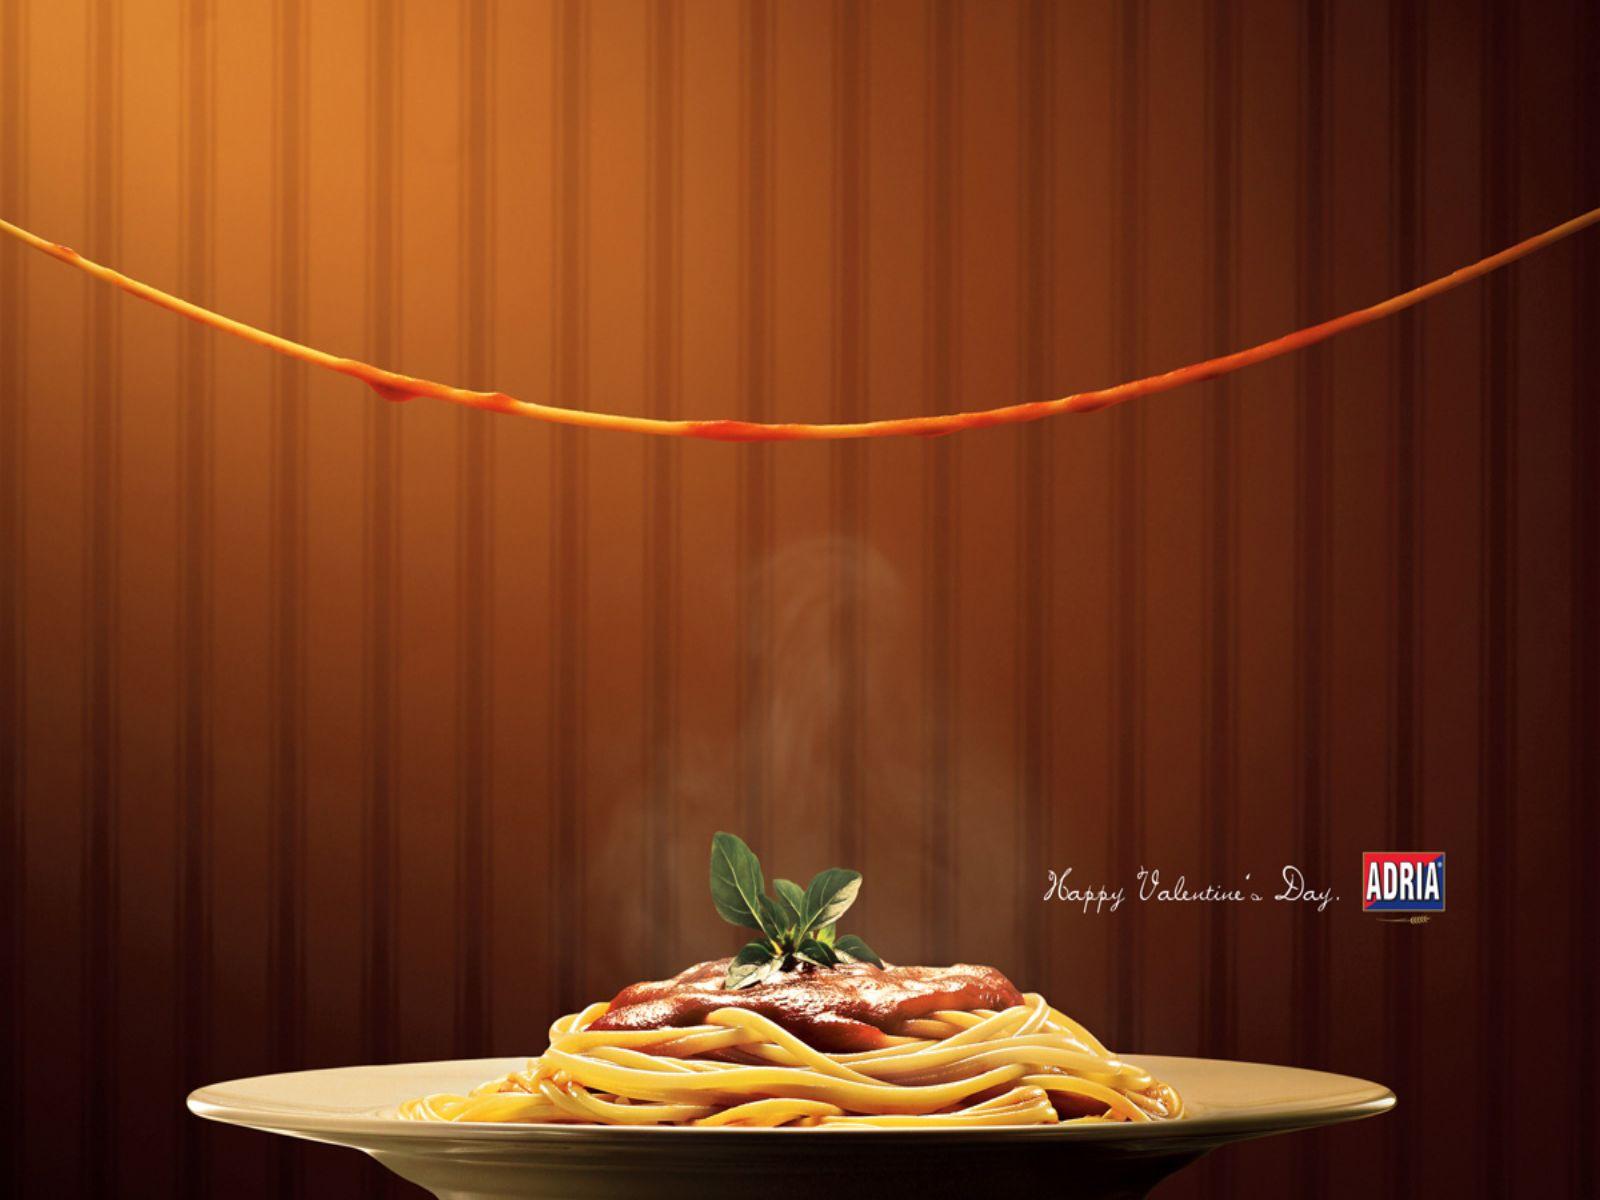 этих креативная реклама кафе фото гибрид глоксинии